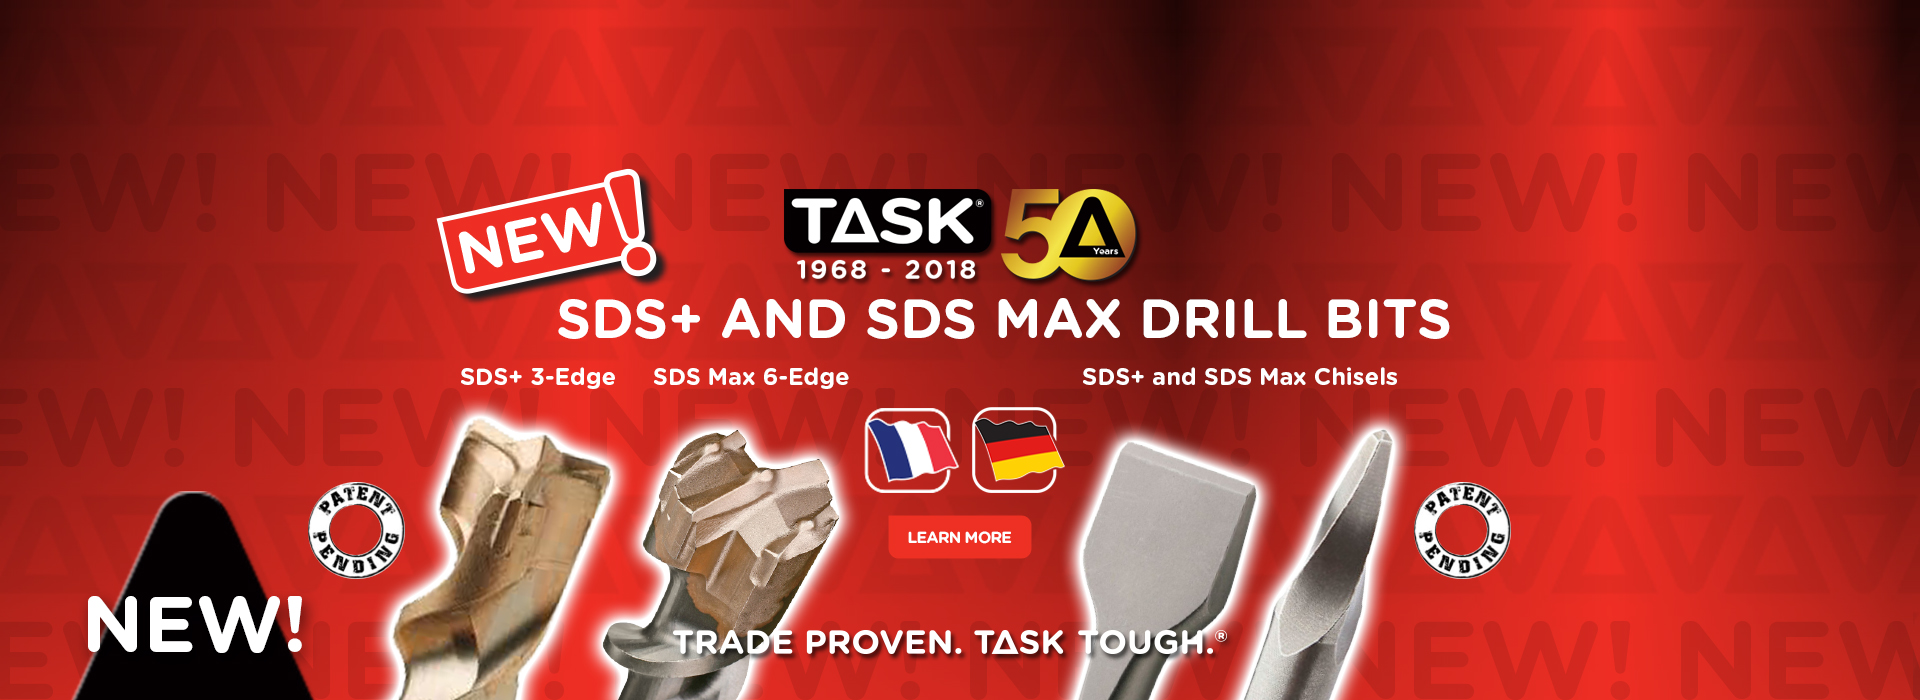 Task SDS+ and SDS Max Drill Bits